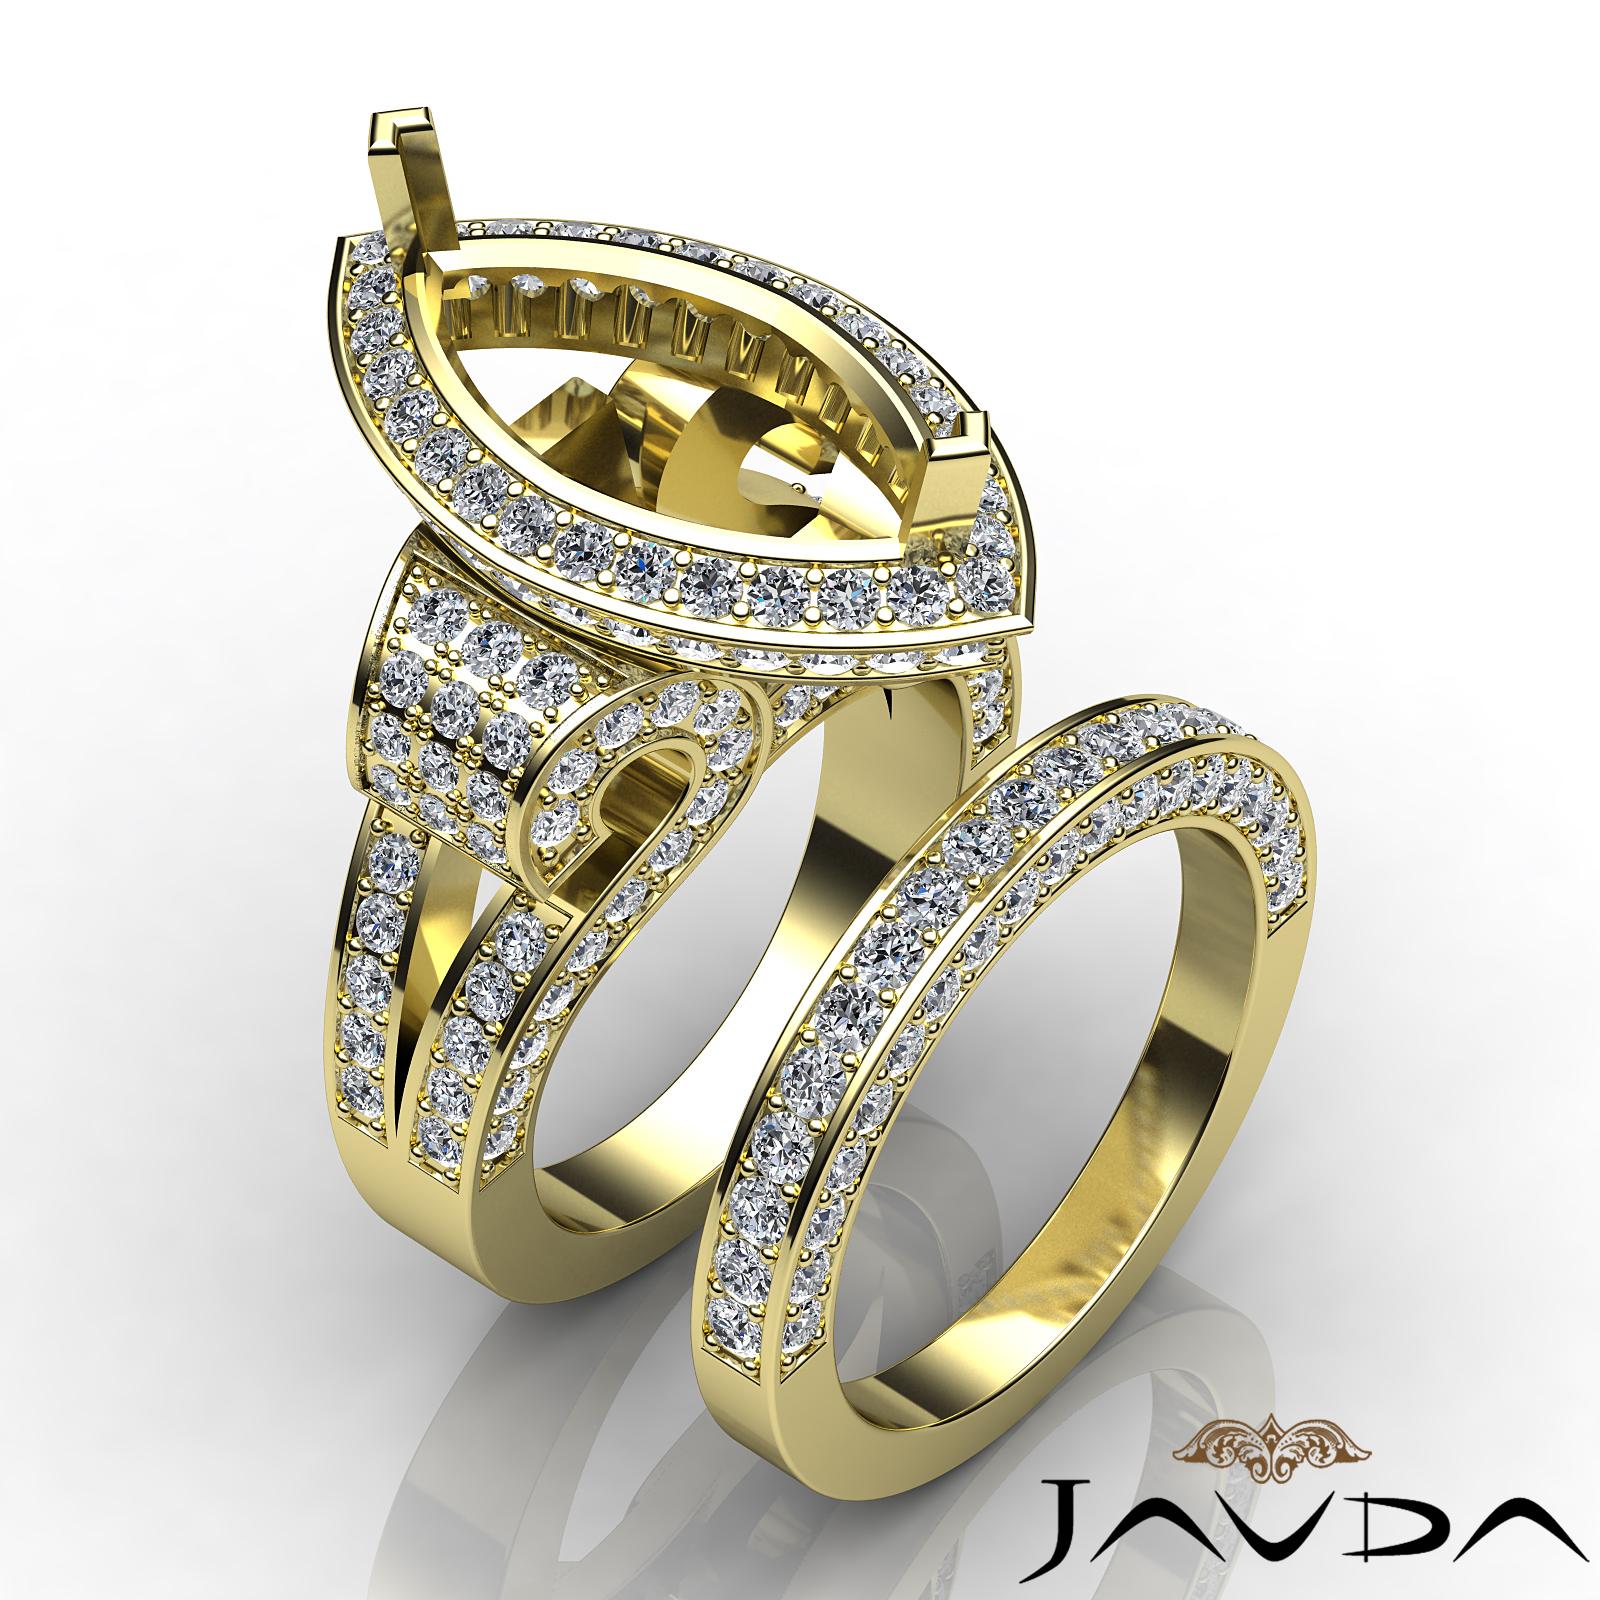 diamond engagement ring marquise semi mount unique bridal. Black Bedroom Furniture Sets. Home Design Ideas